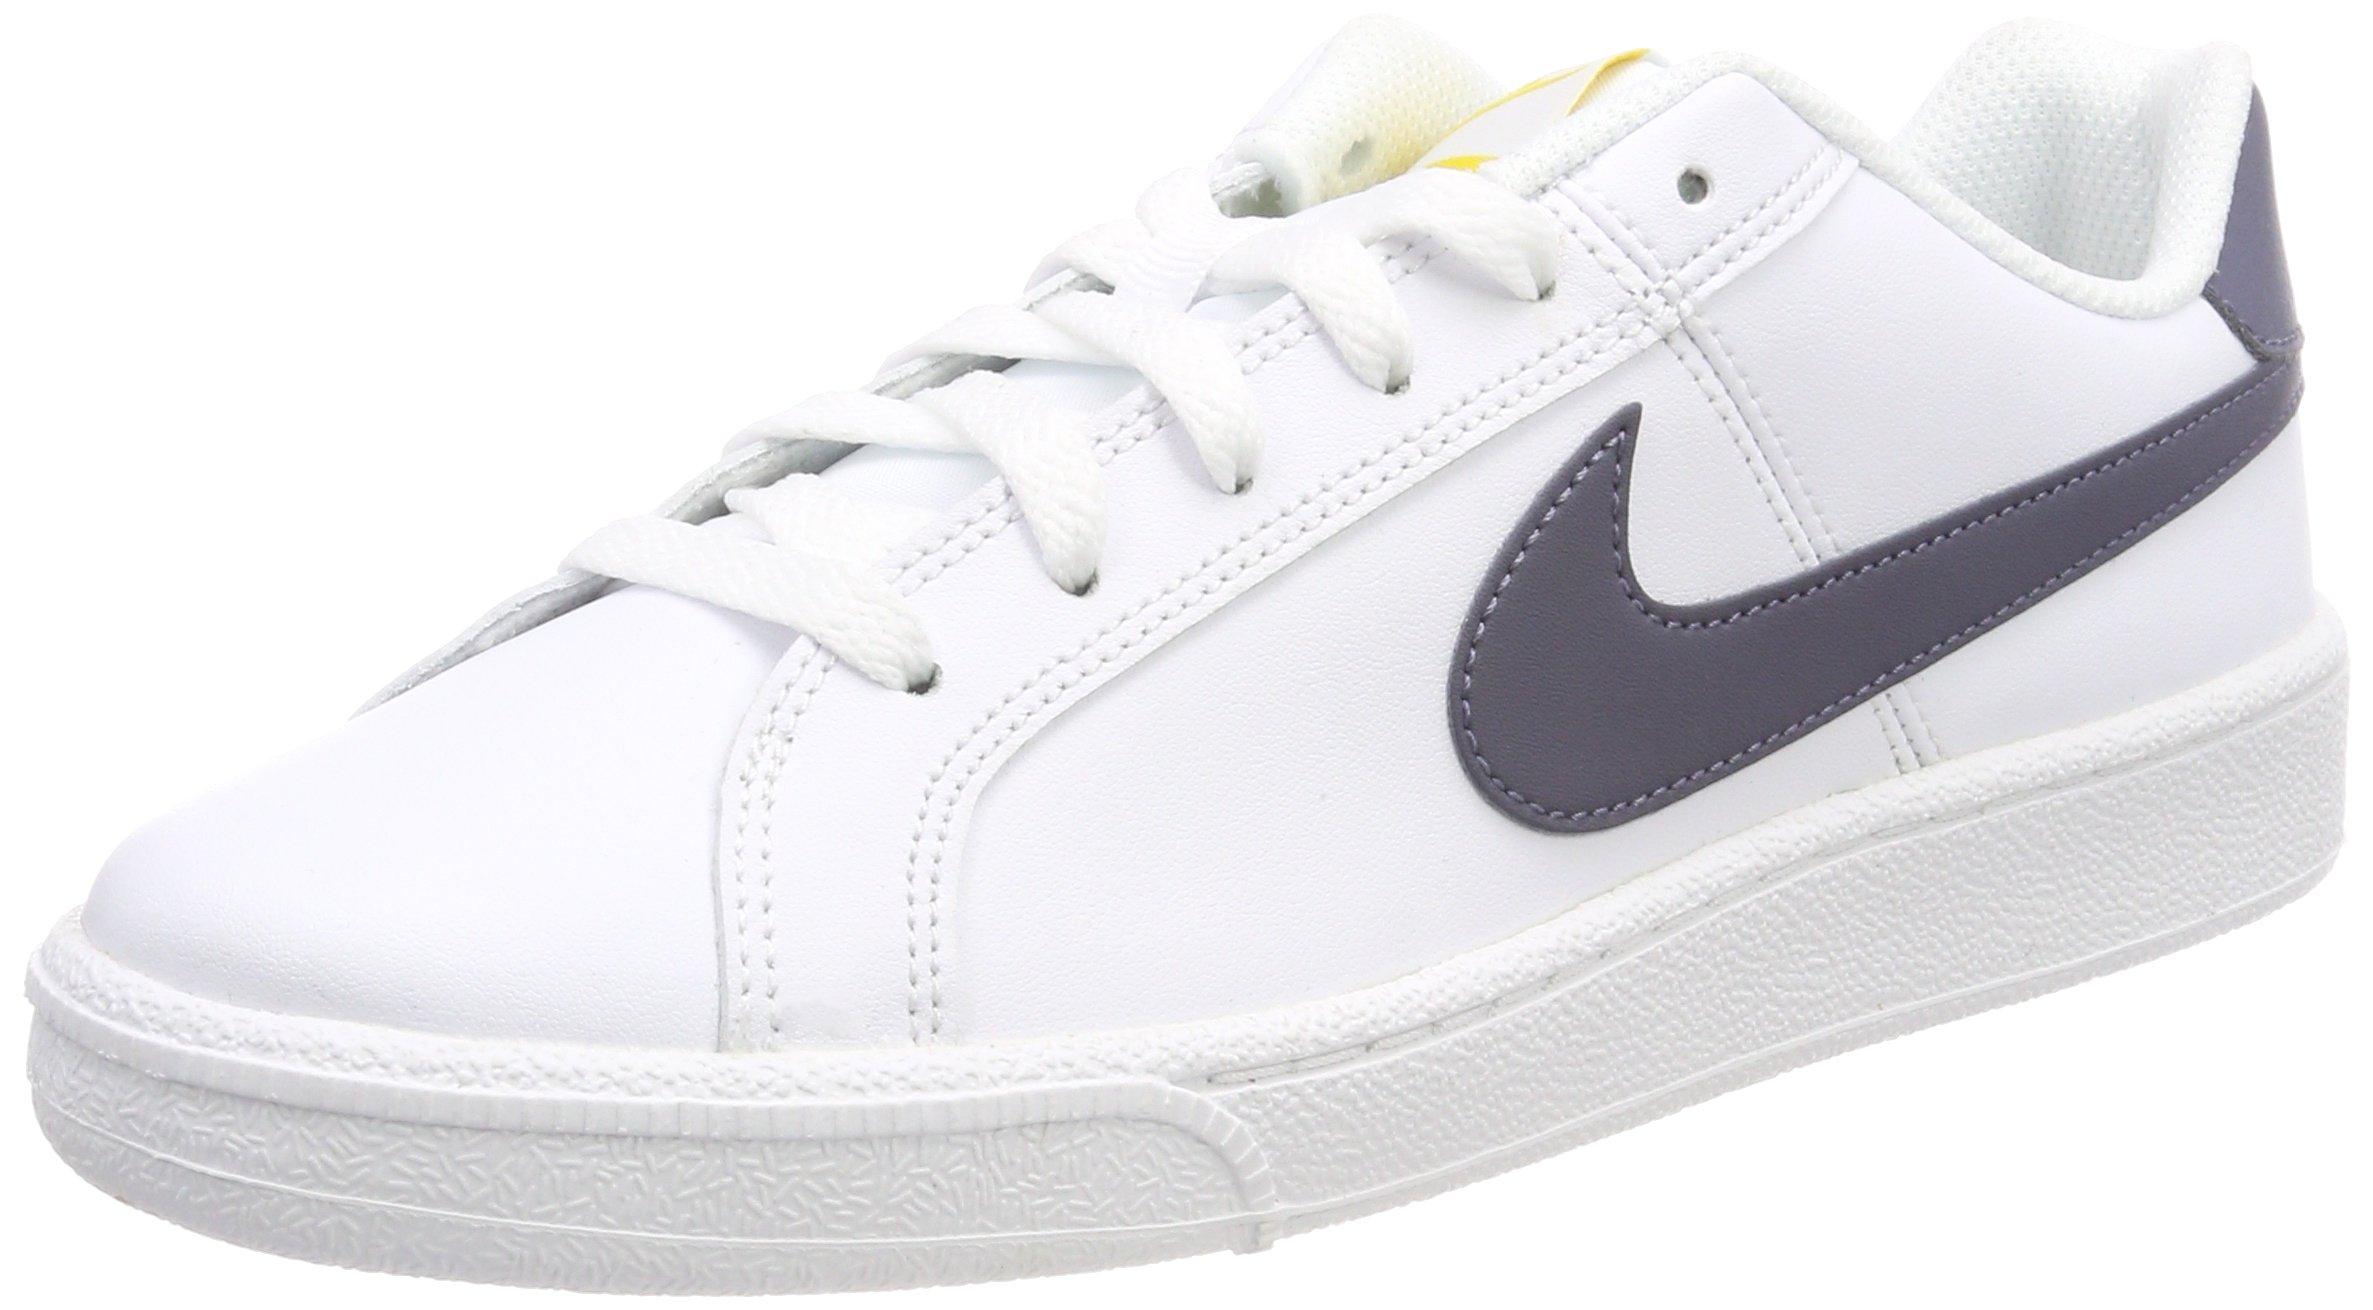 b12ab7c67edd3 Galleon - Nike Men''s Court Royale Trainers, (White/Light Carbon-Vivid  Sulfur 105), 10 UK 45 EU